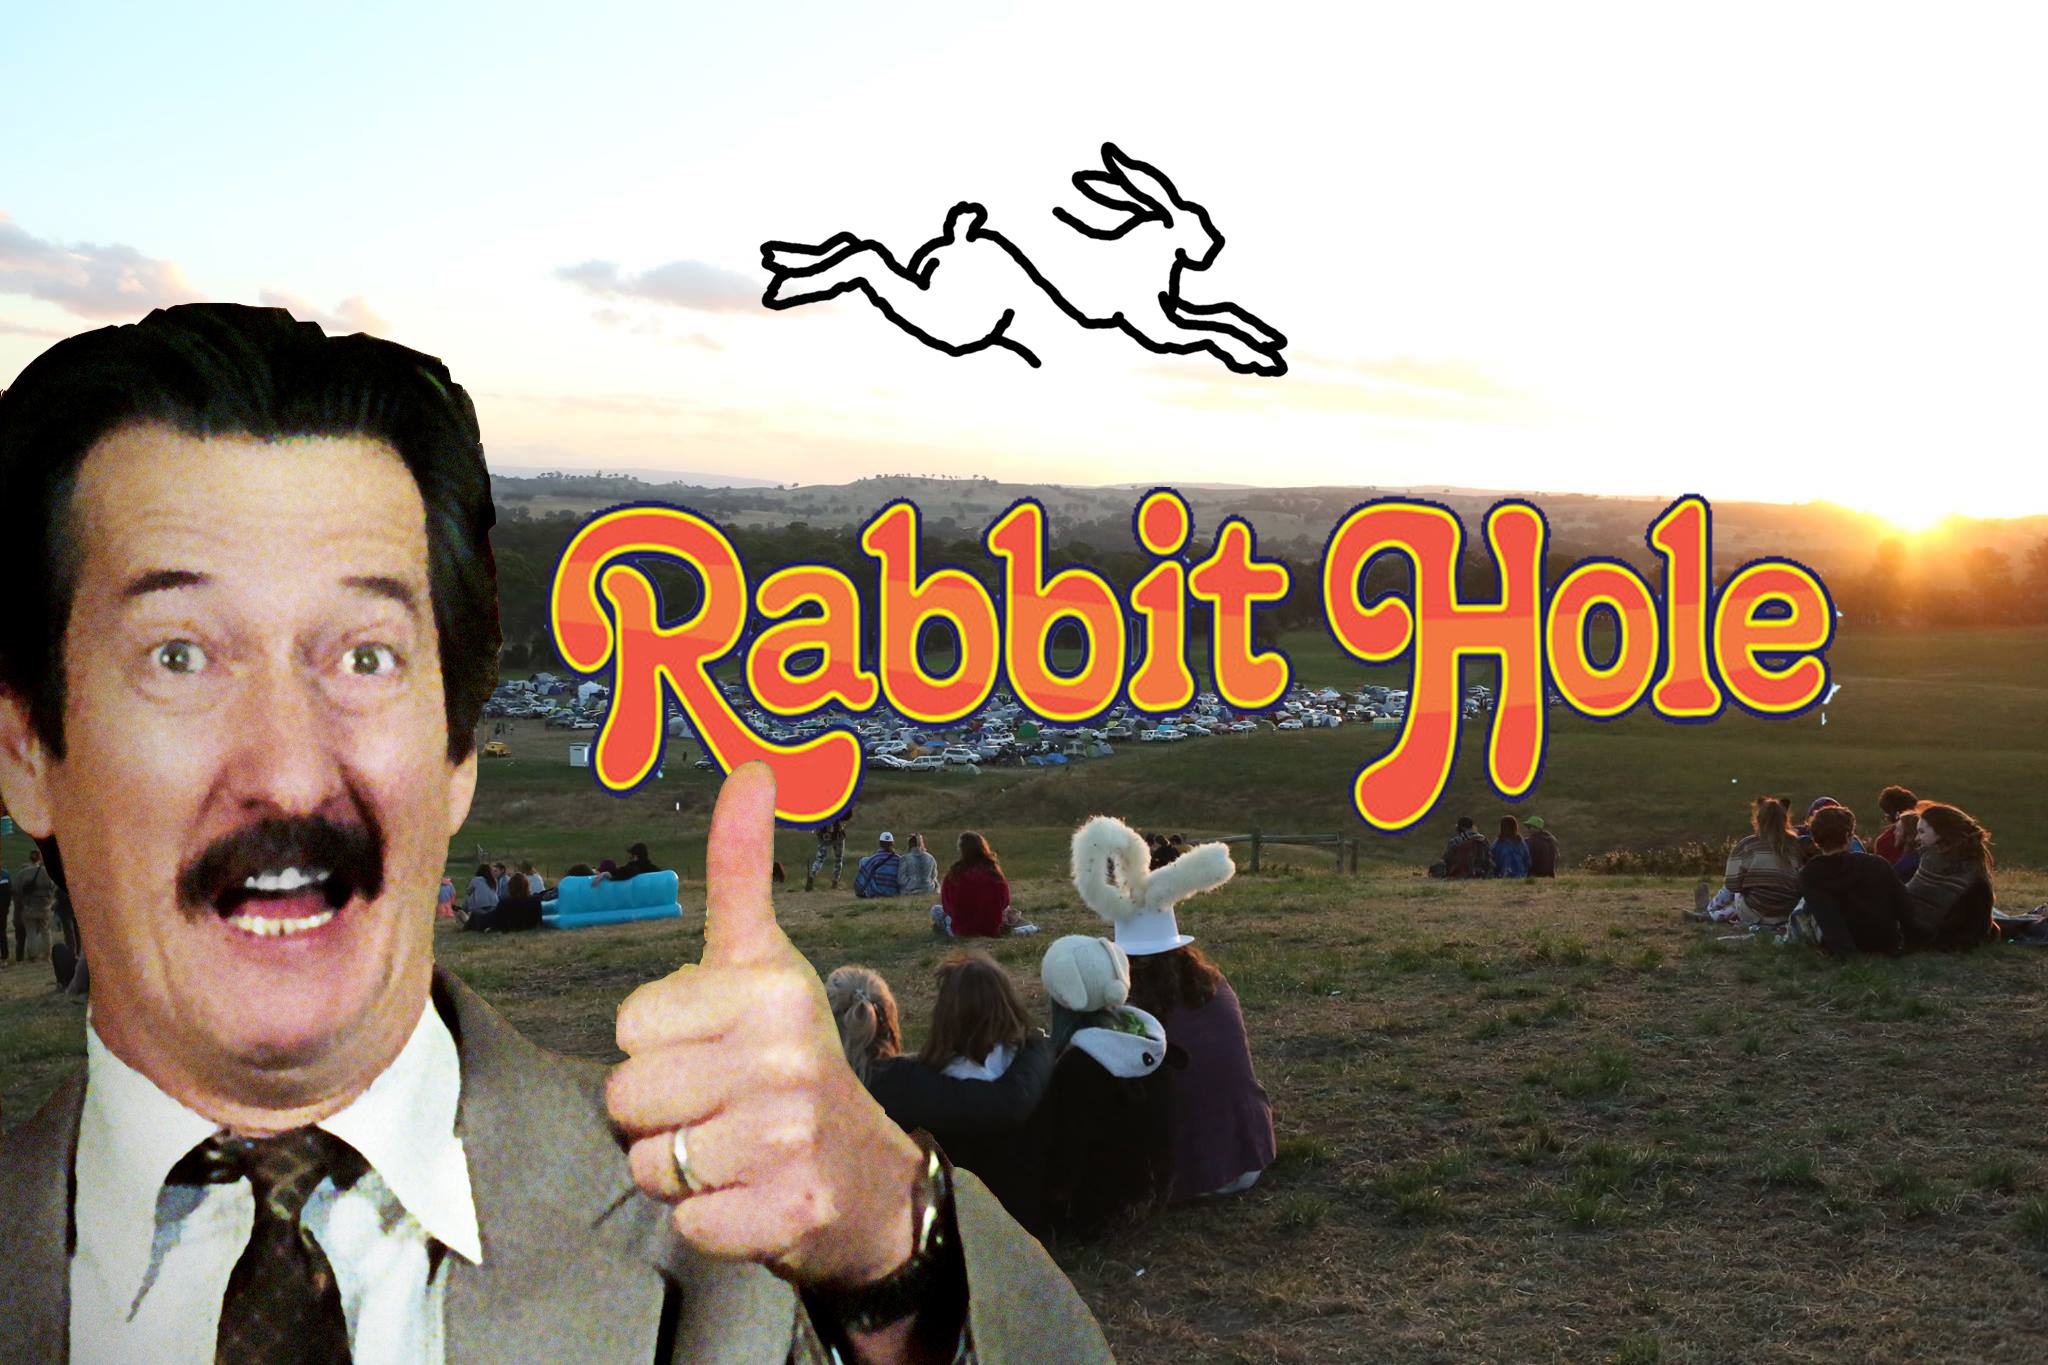 Rabbit hole.jpg